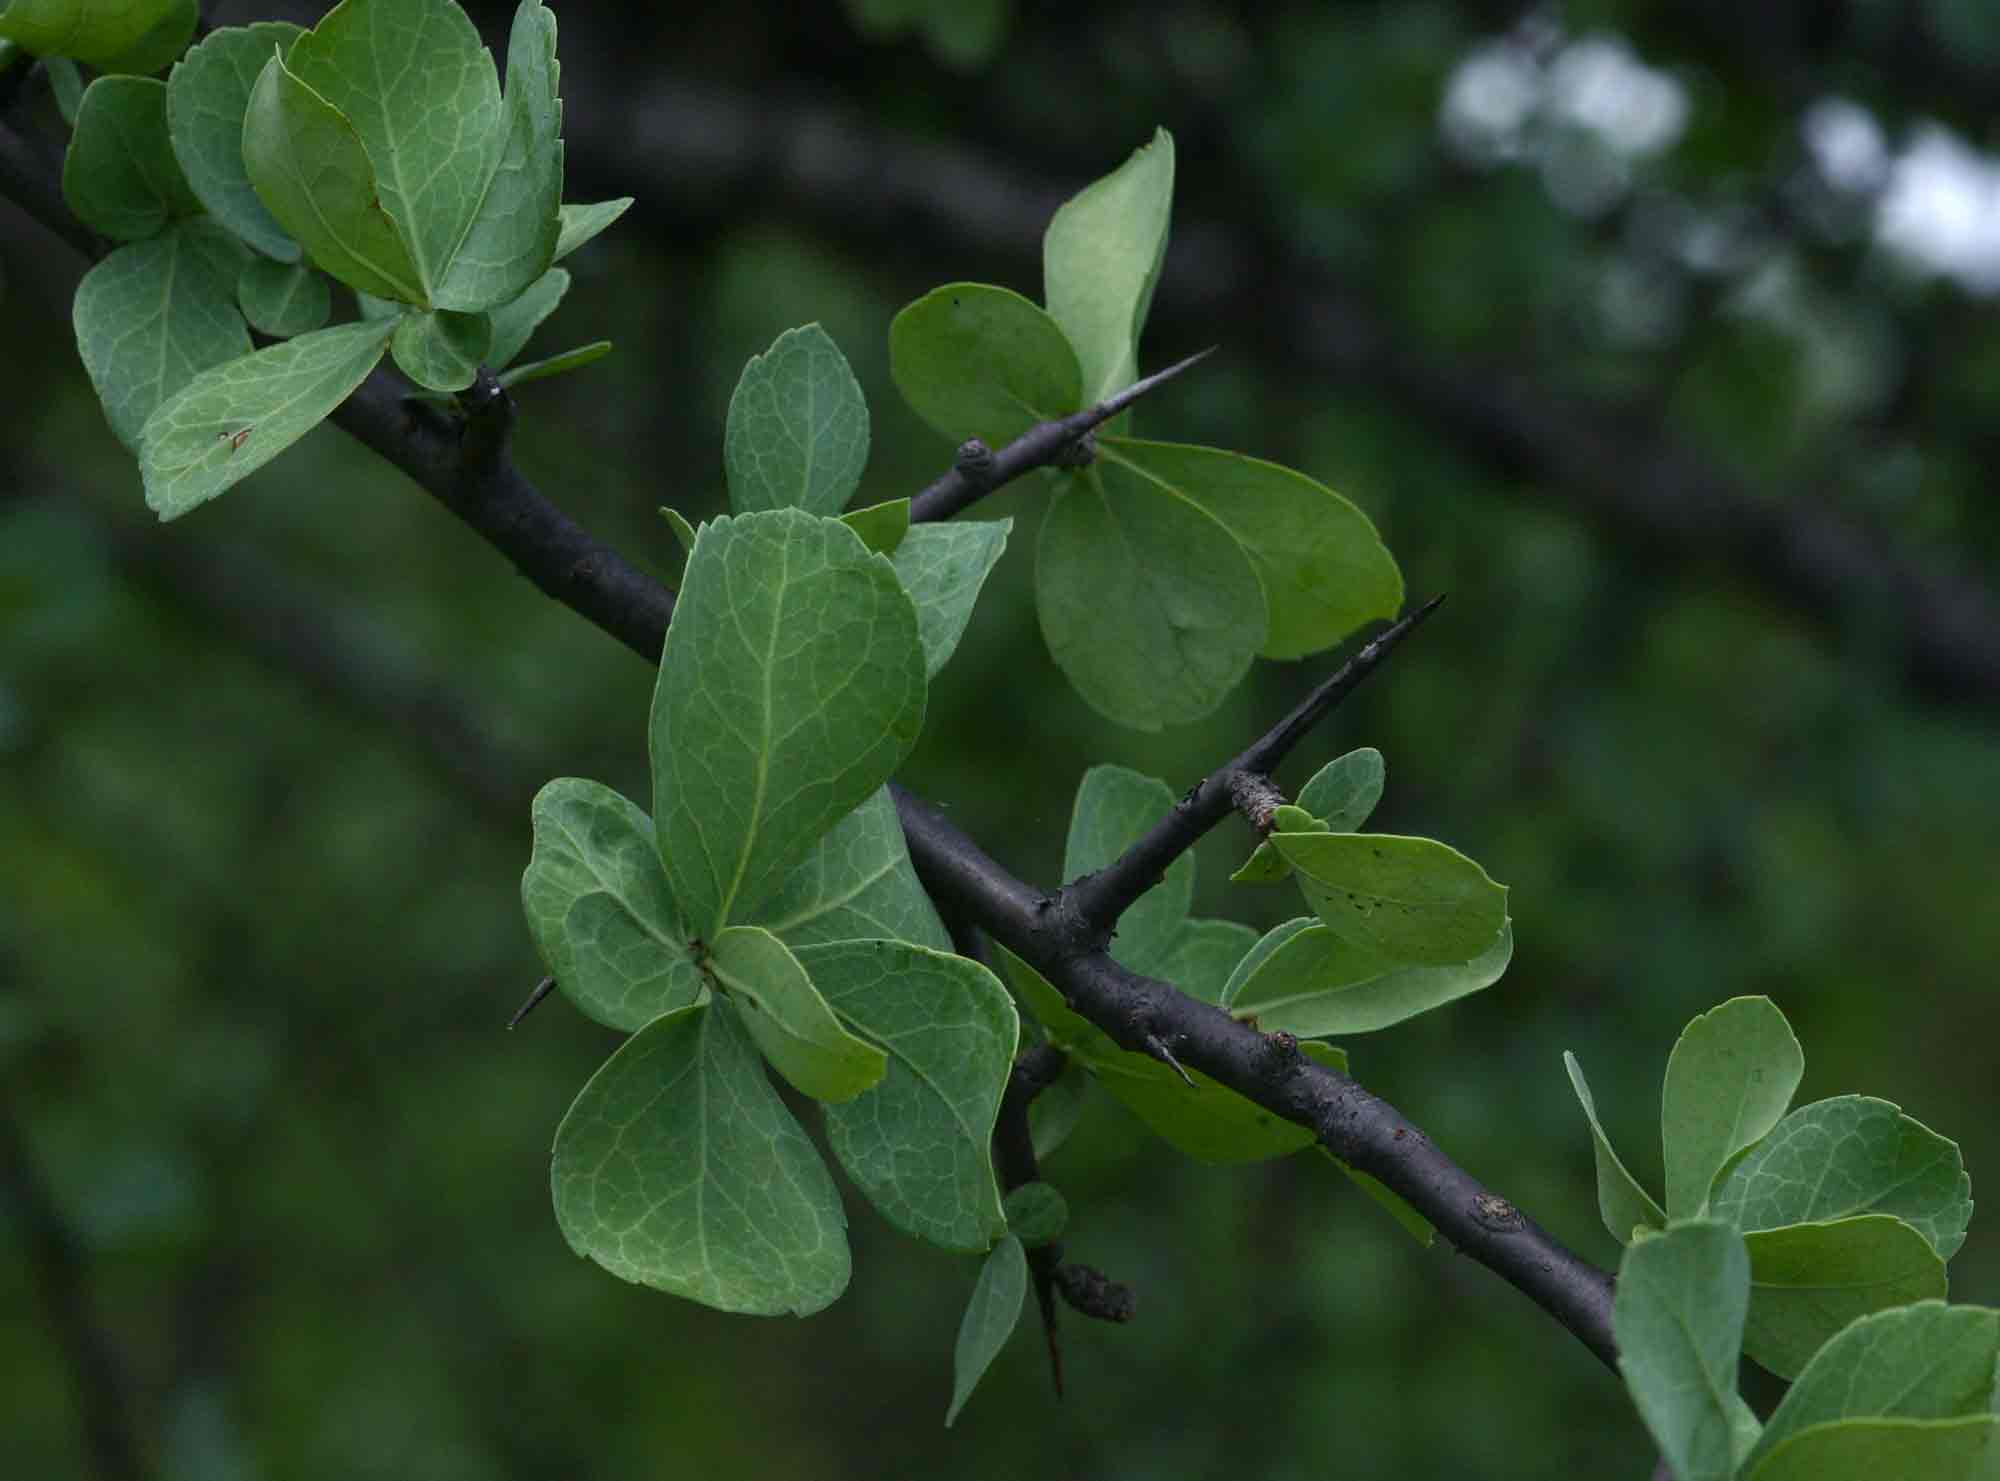 Commiphora viminea